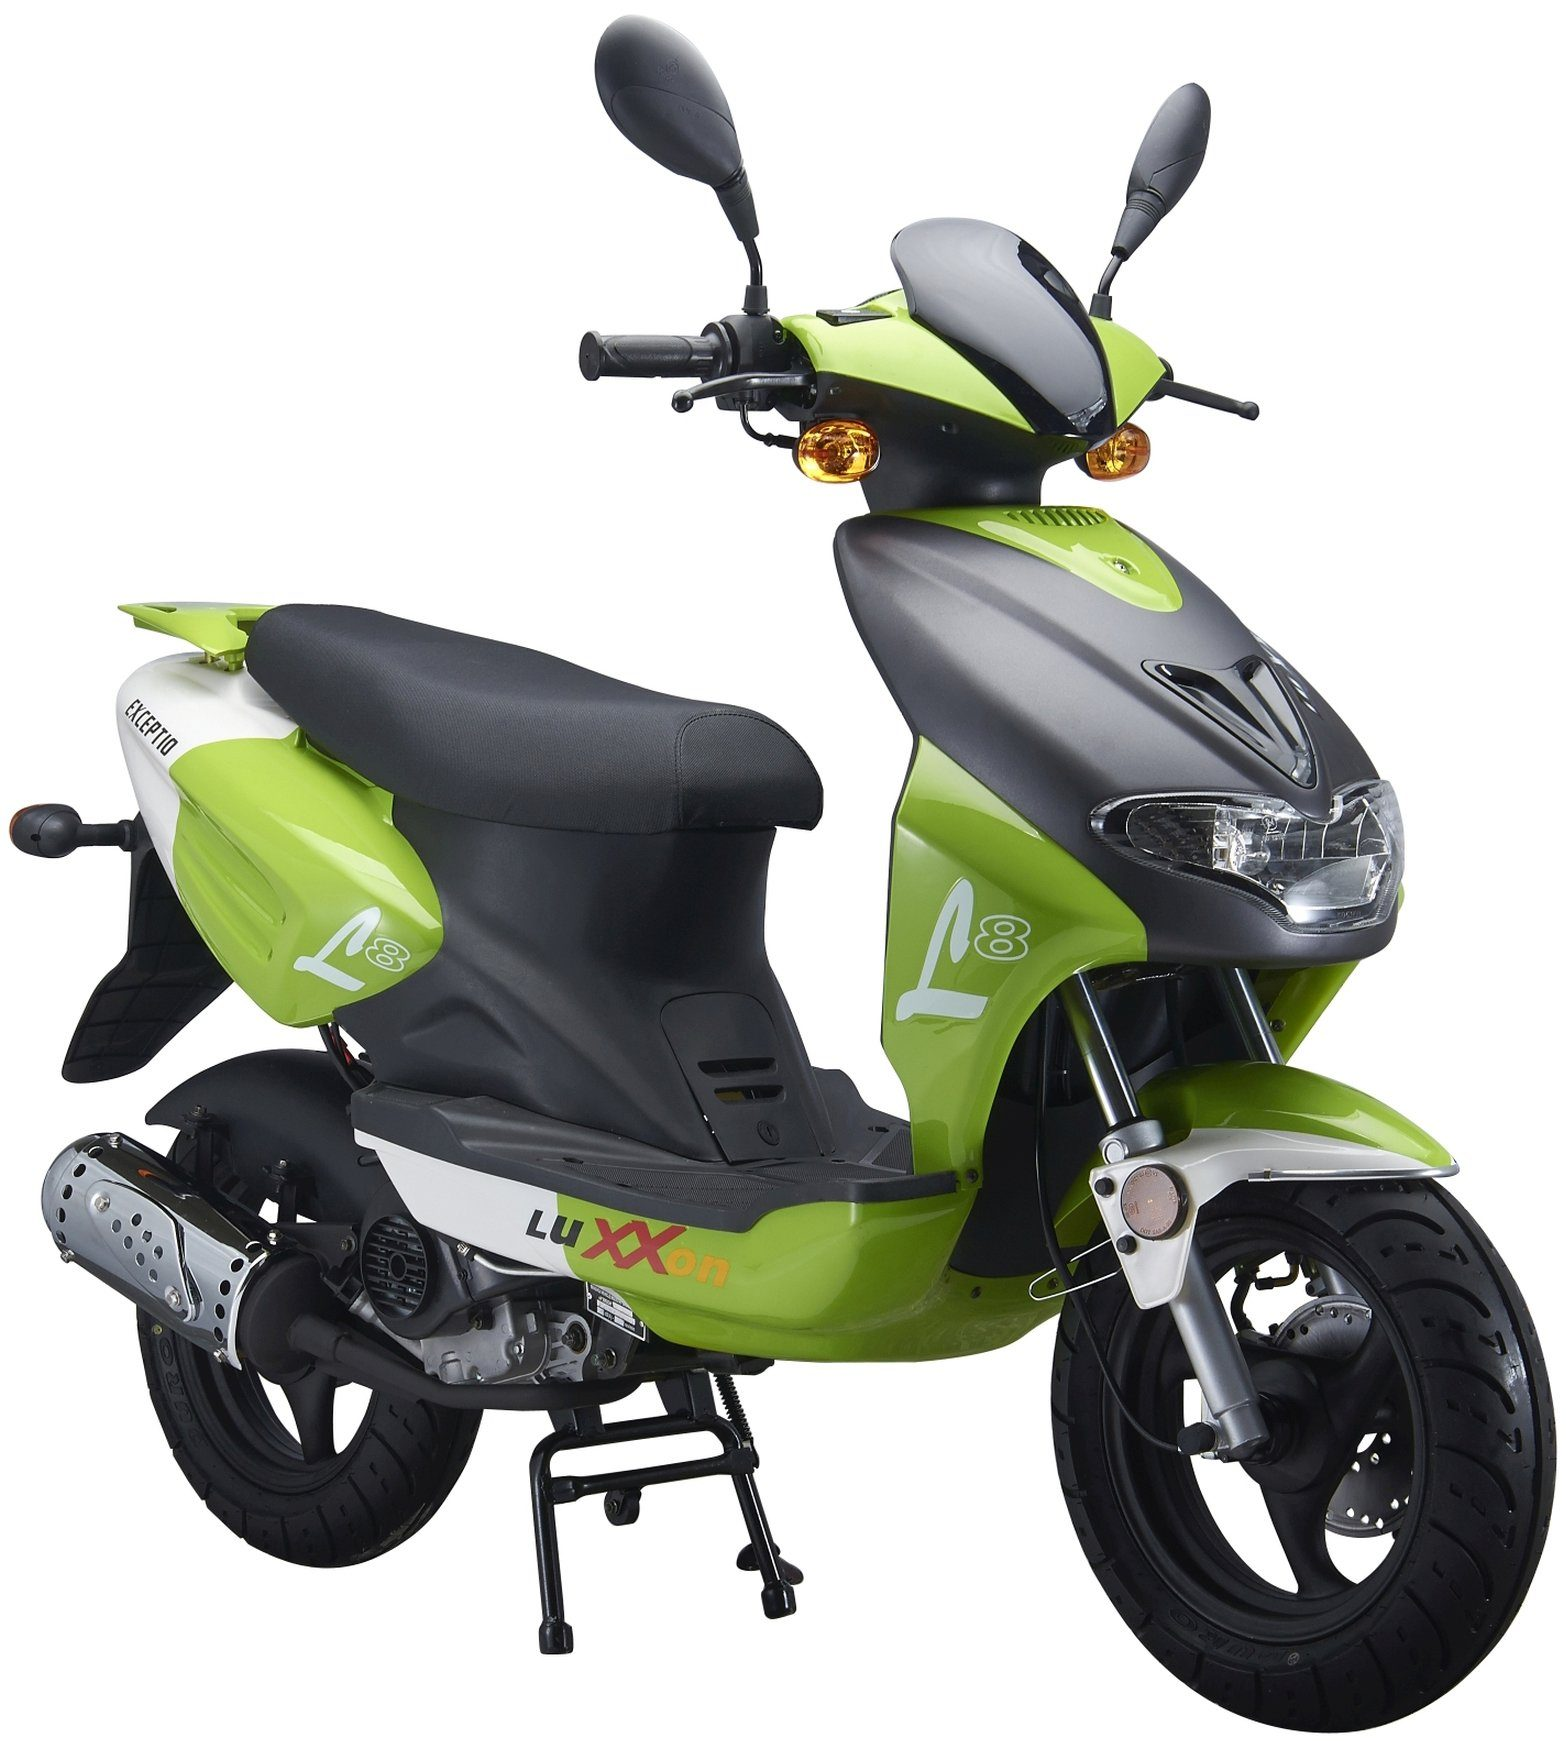 Luxxon Motorroller, 50 ccm, 45 km/h, »Exceptio«